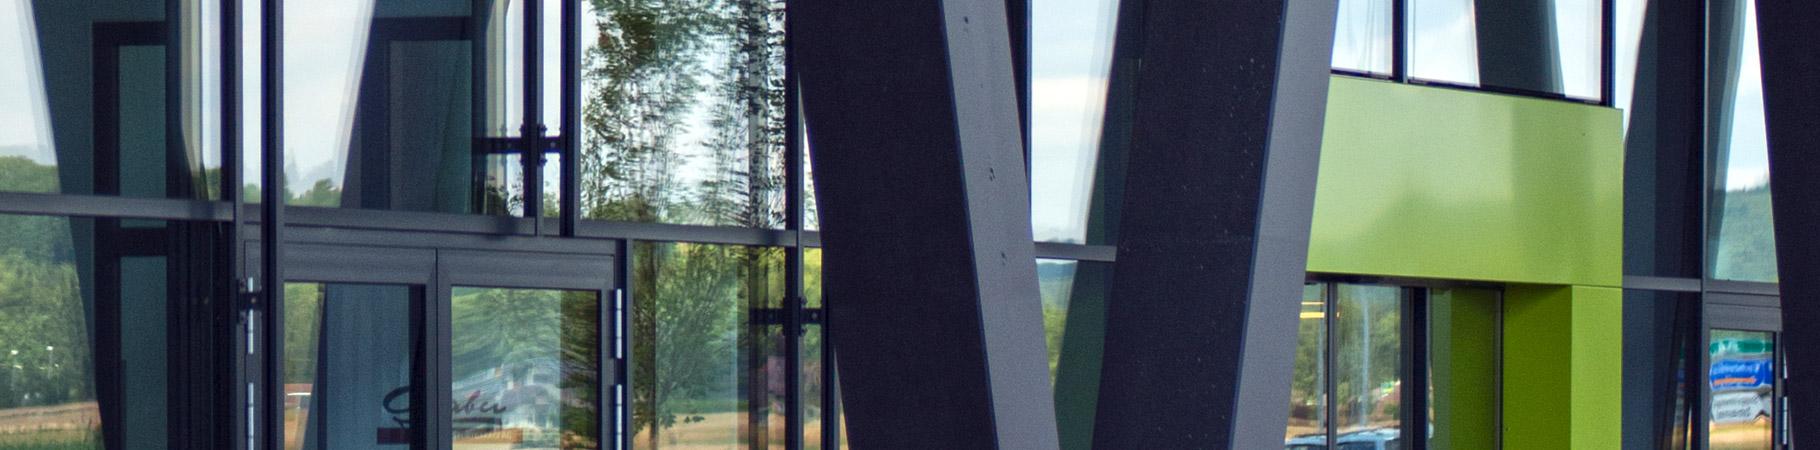 S80 Doors Gutmann Middle East Llc